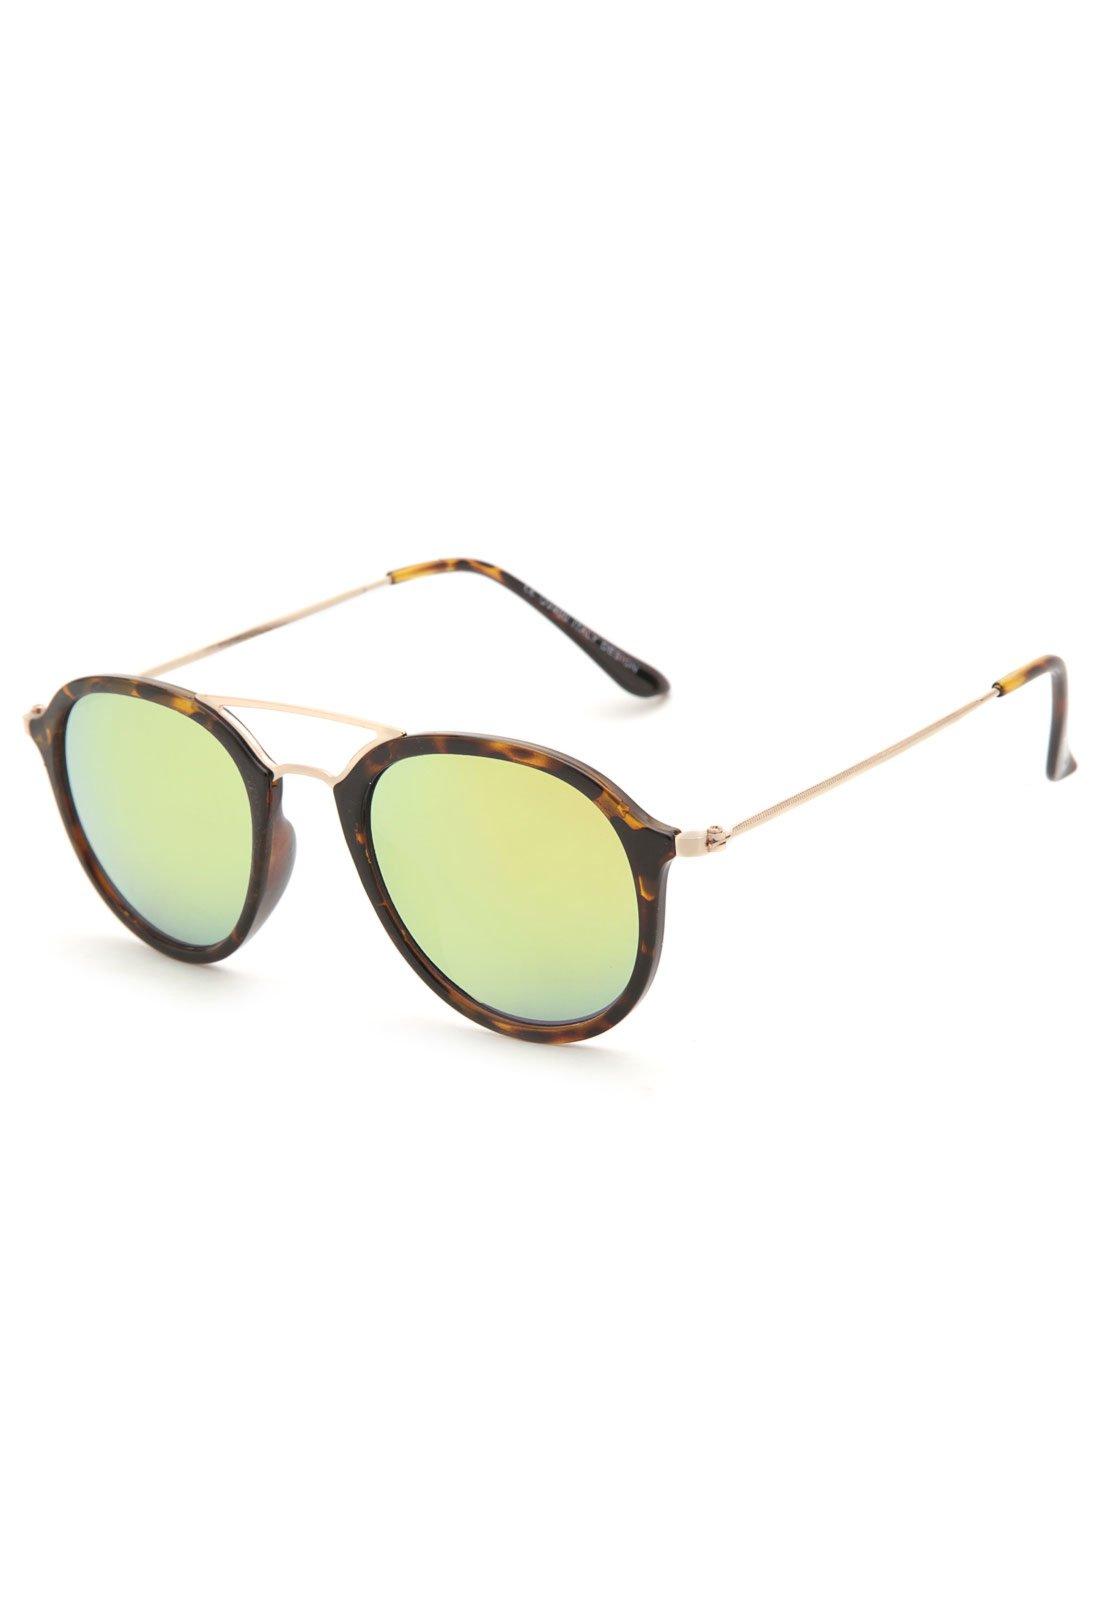 Óculos de Sol Khatto Redondo Tartaruga Marrom Amarelo - Compre Agora    Kanui Brasil fdc7d55365